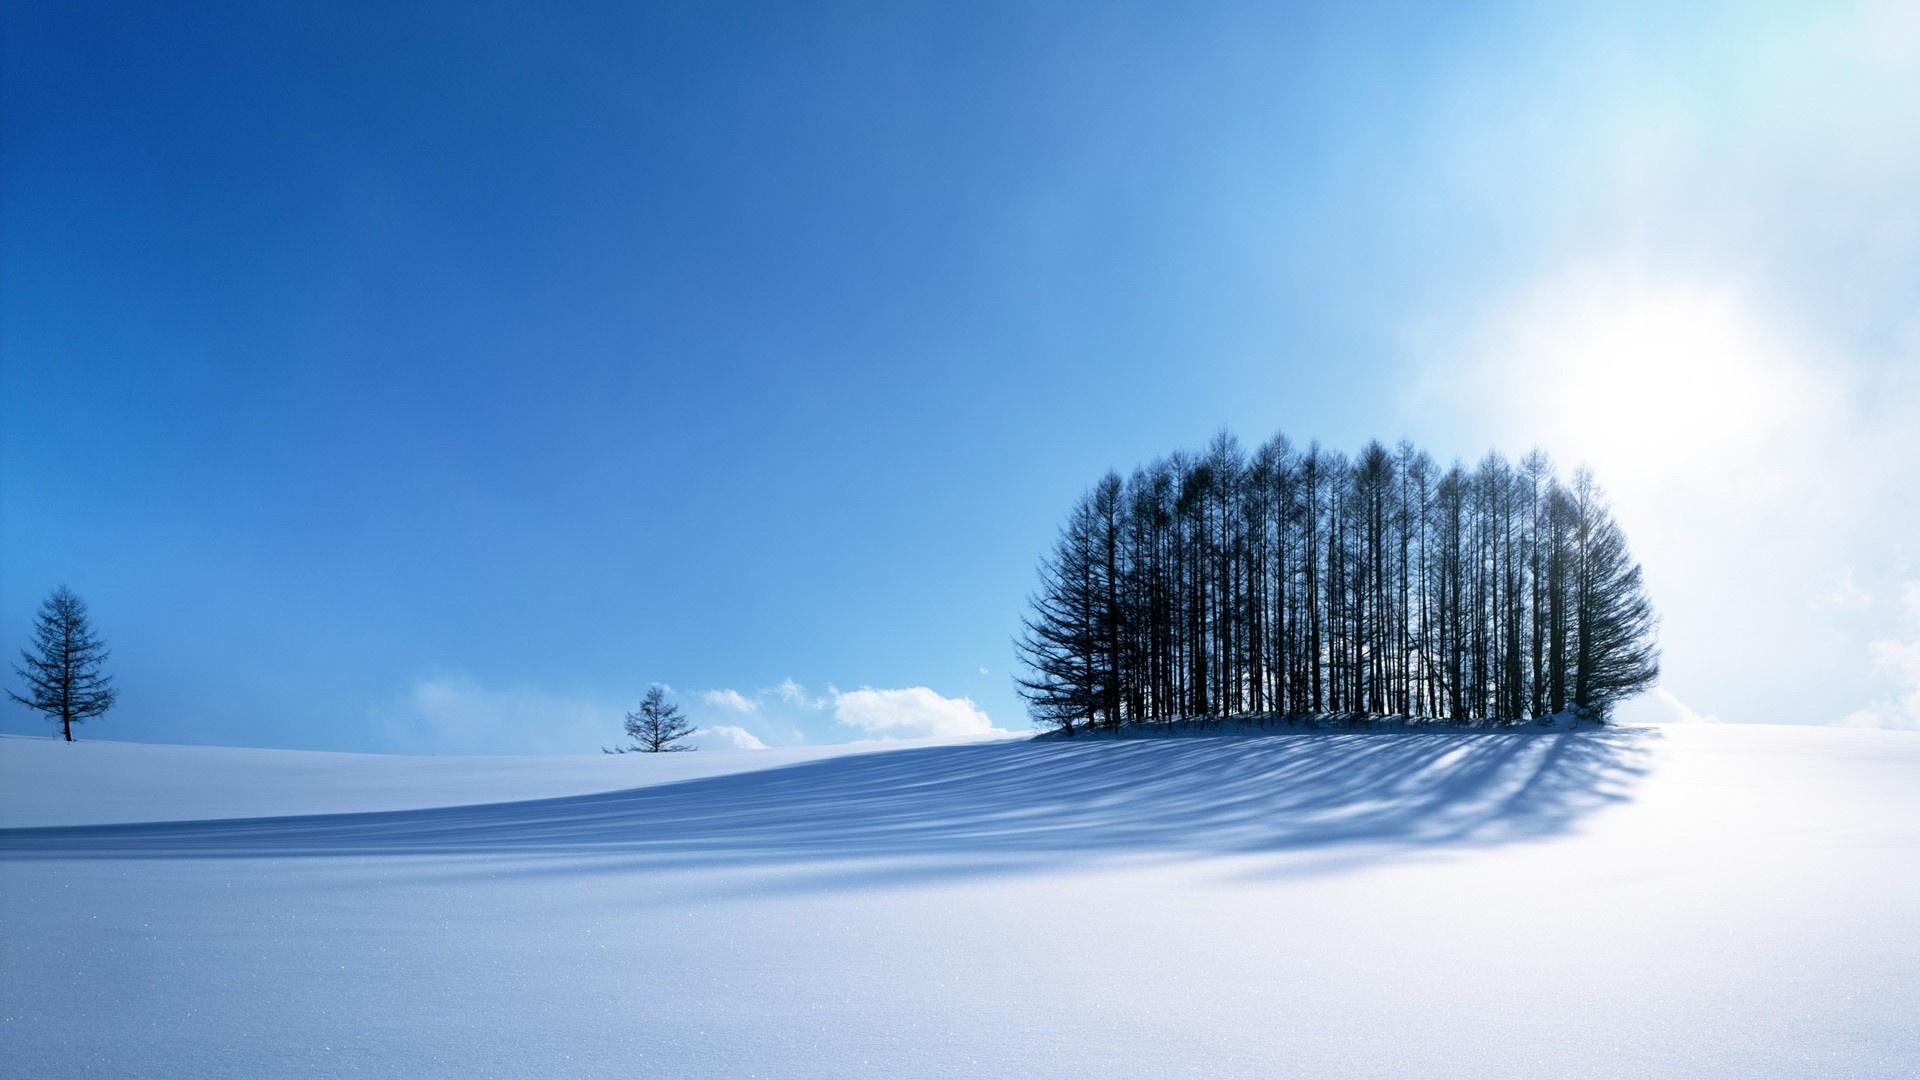 ... Cold Wallpaper · Cold Wallpaper